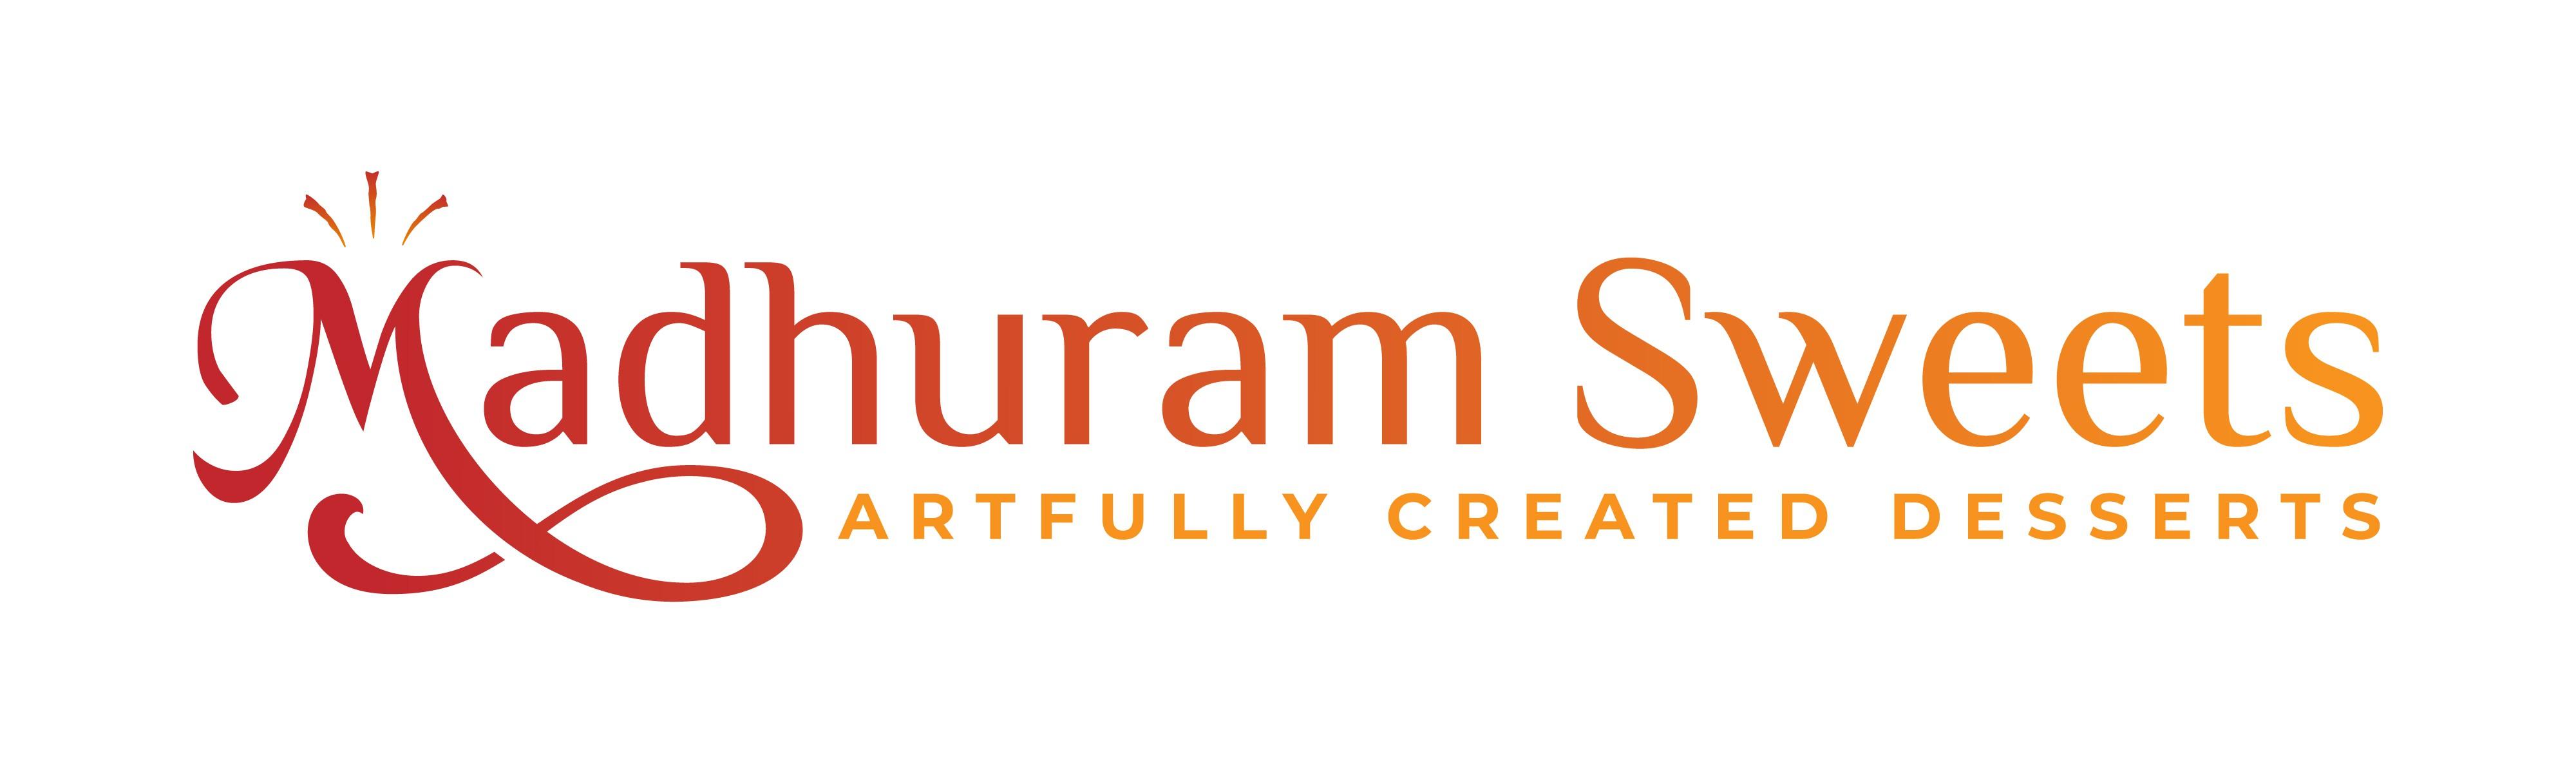 Madhuram Sweets Logo Design